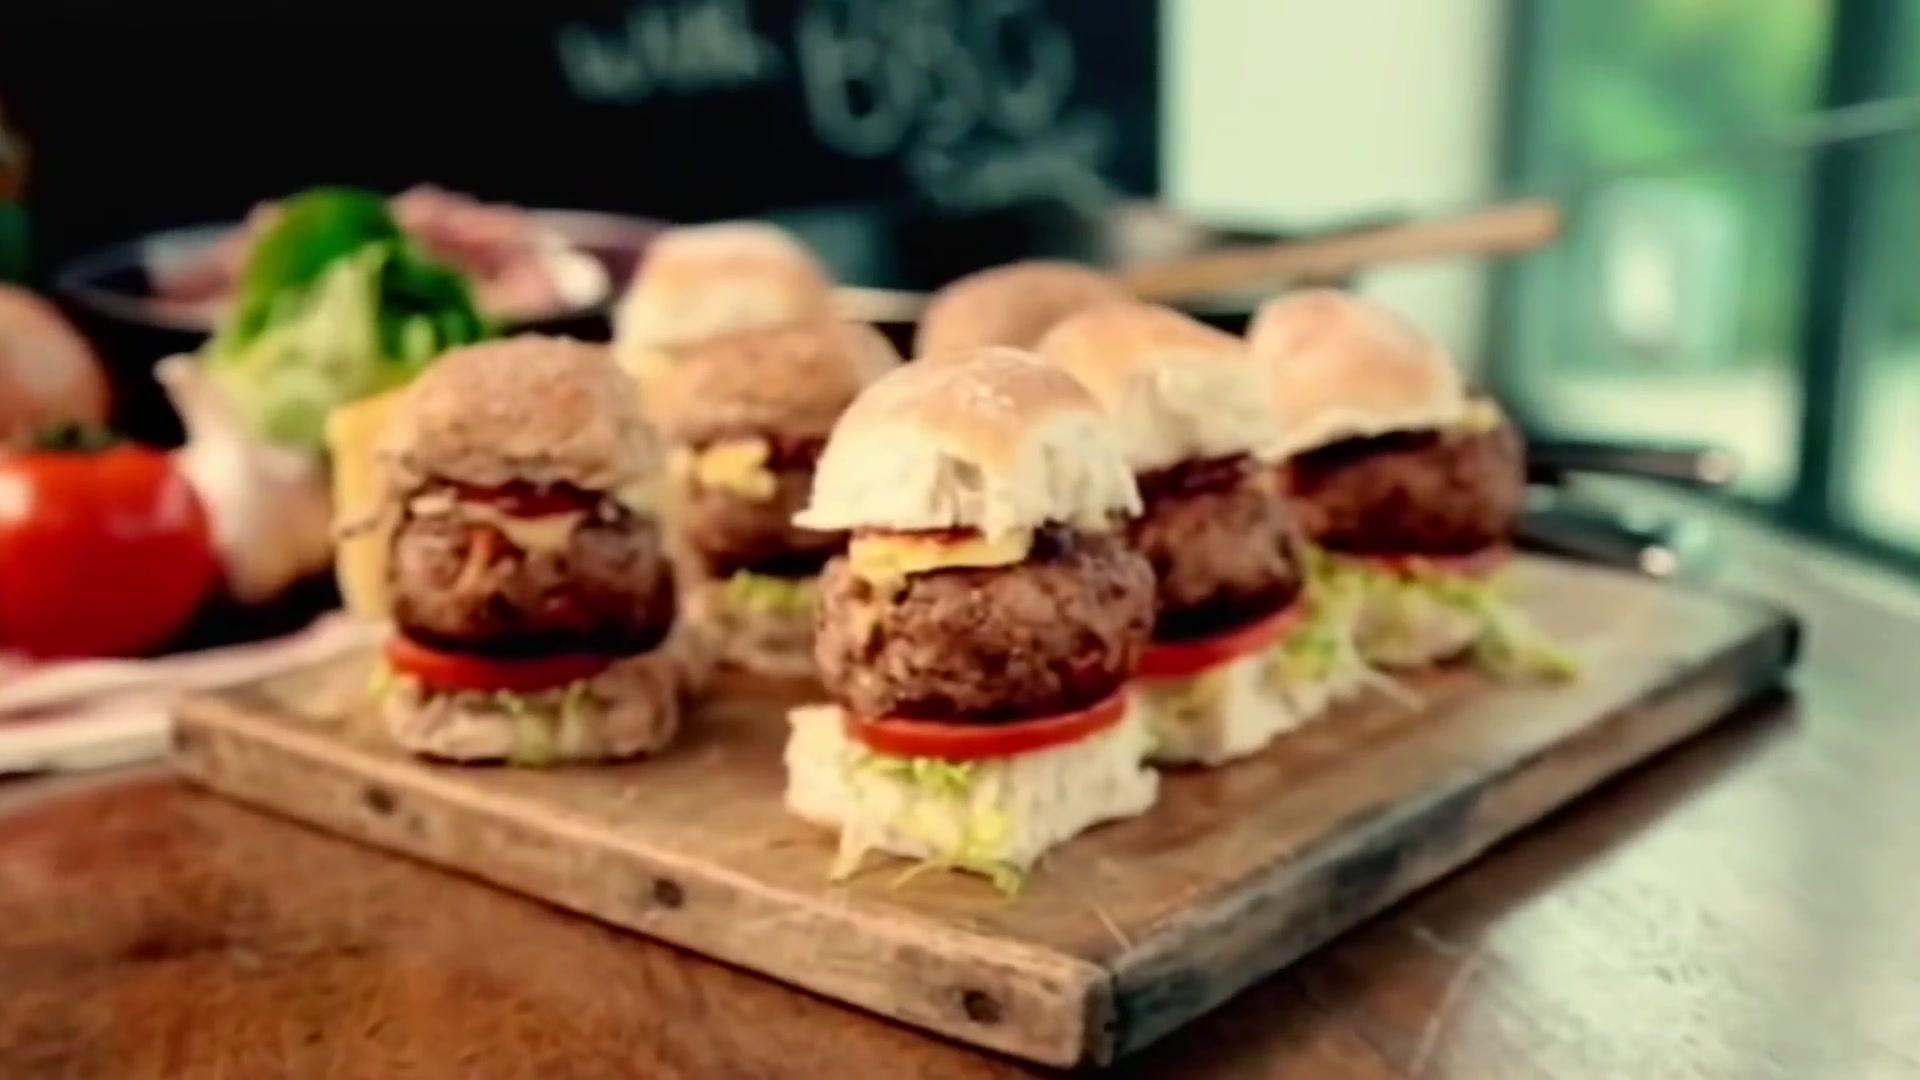 How to Make Gordon Ramsay's Smoky Pork Sliders With BBQ Sauce